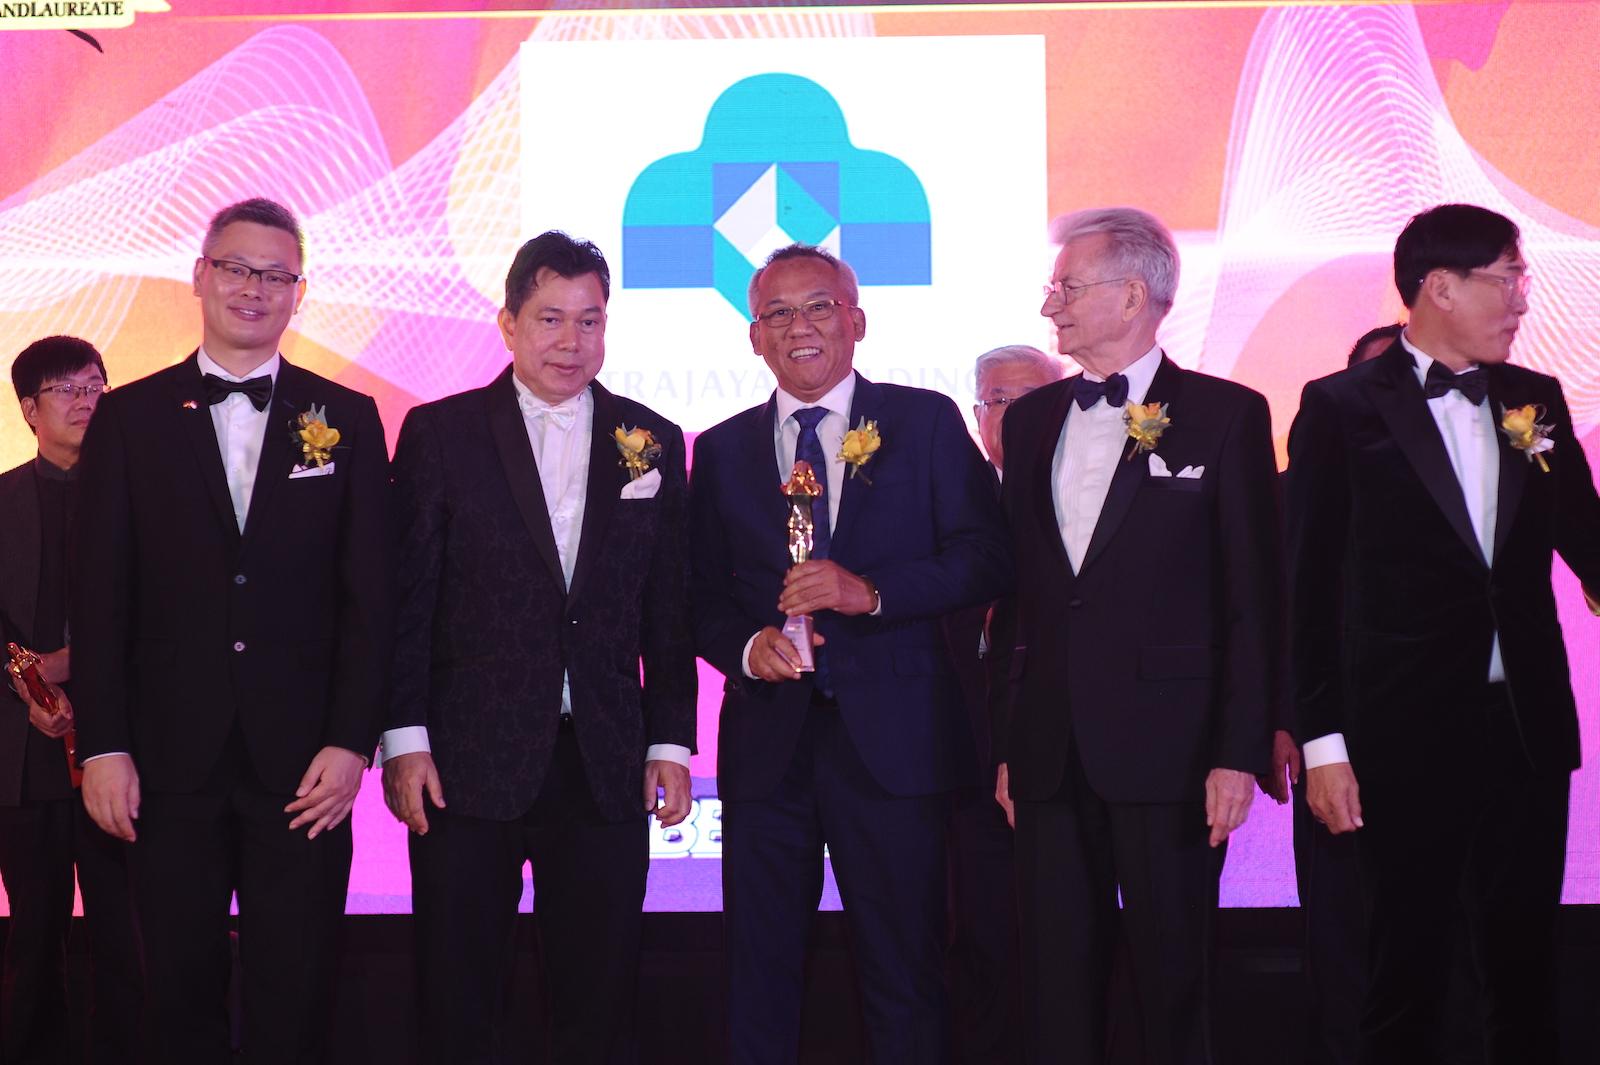 31 October 2019: THE BRANDLAUREATE WORLD BESTBRANDS AWARDS 2019 1